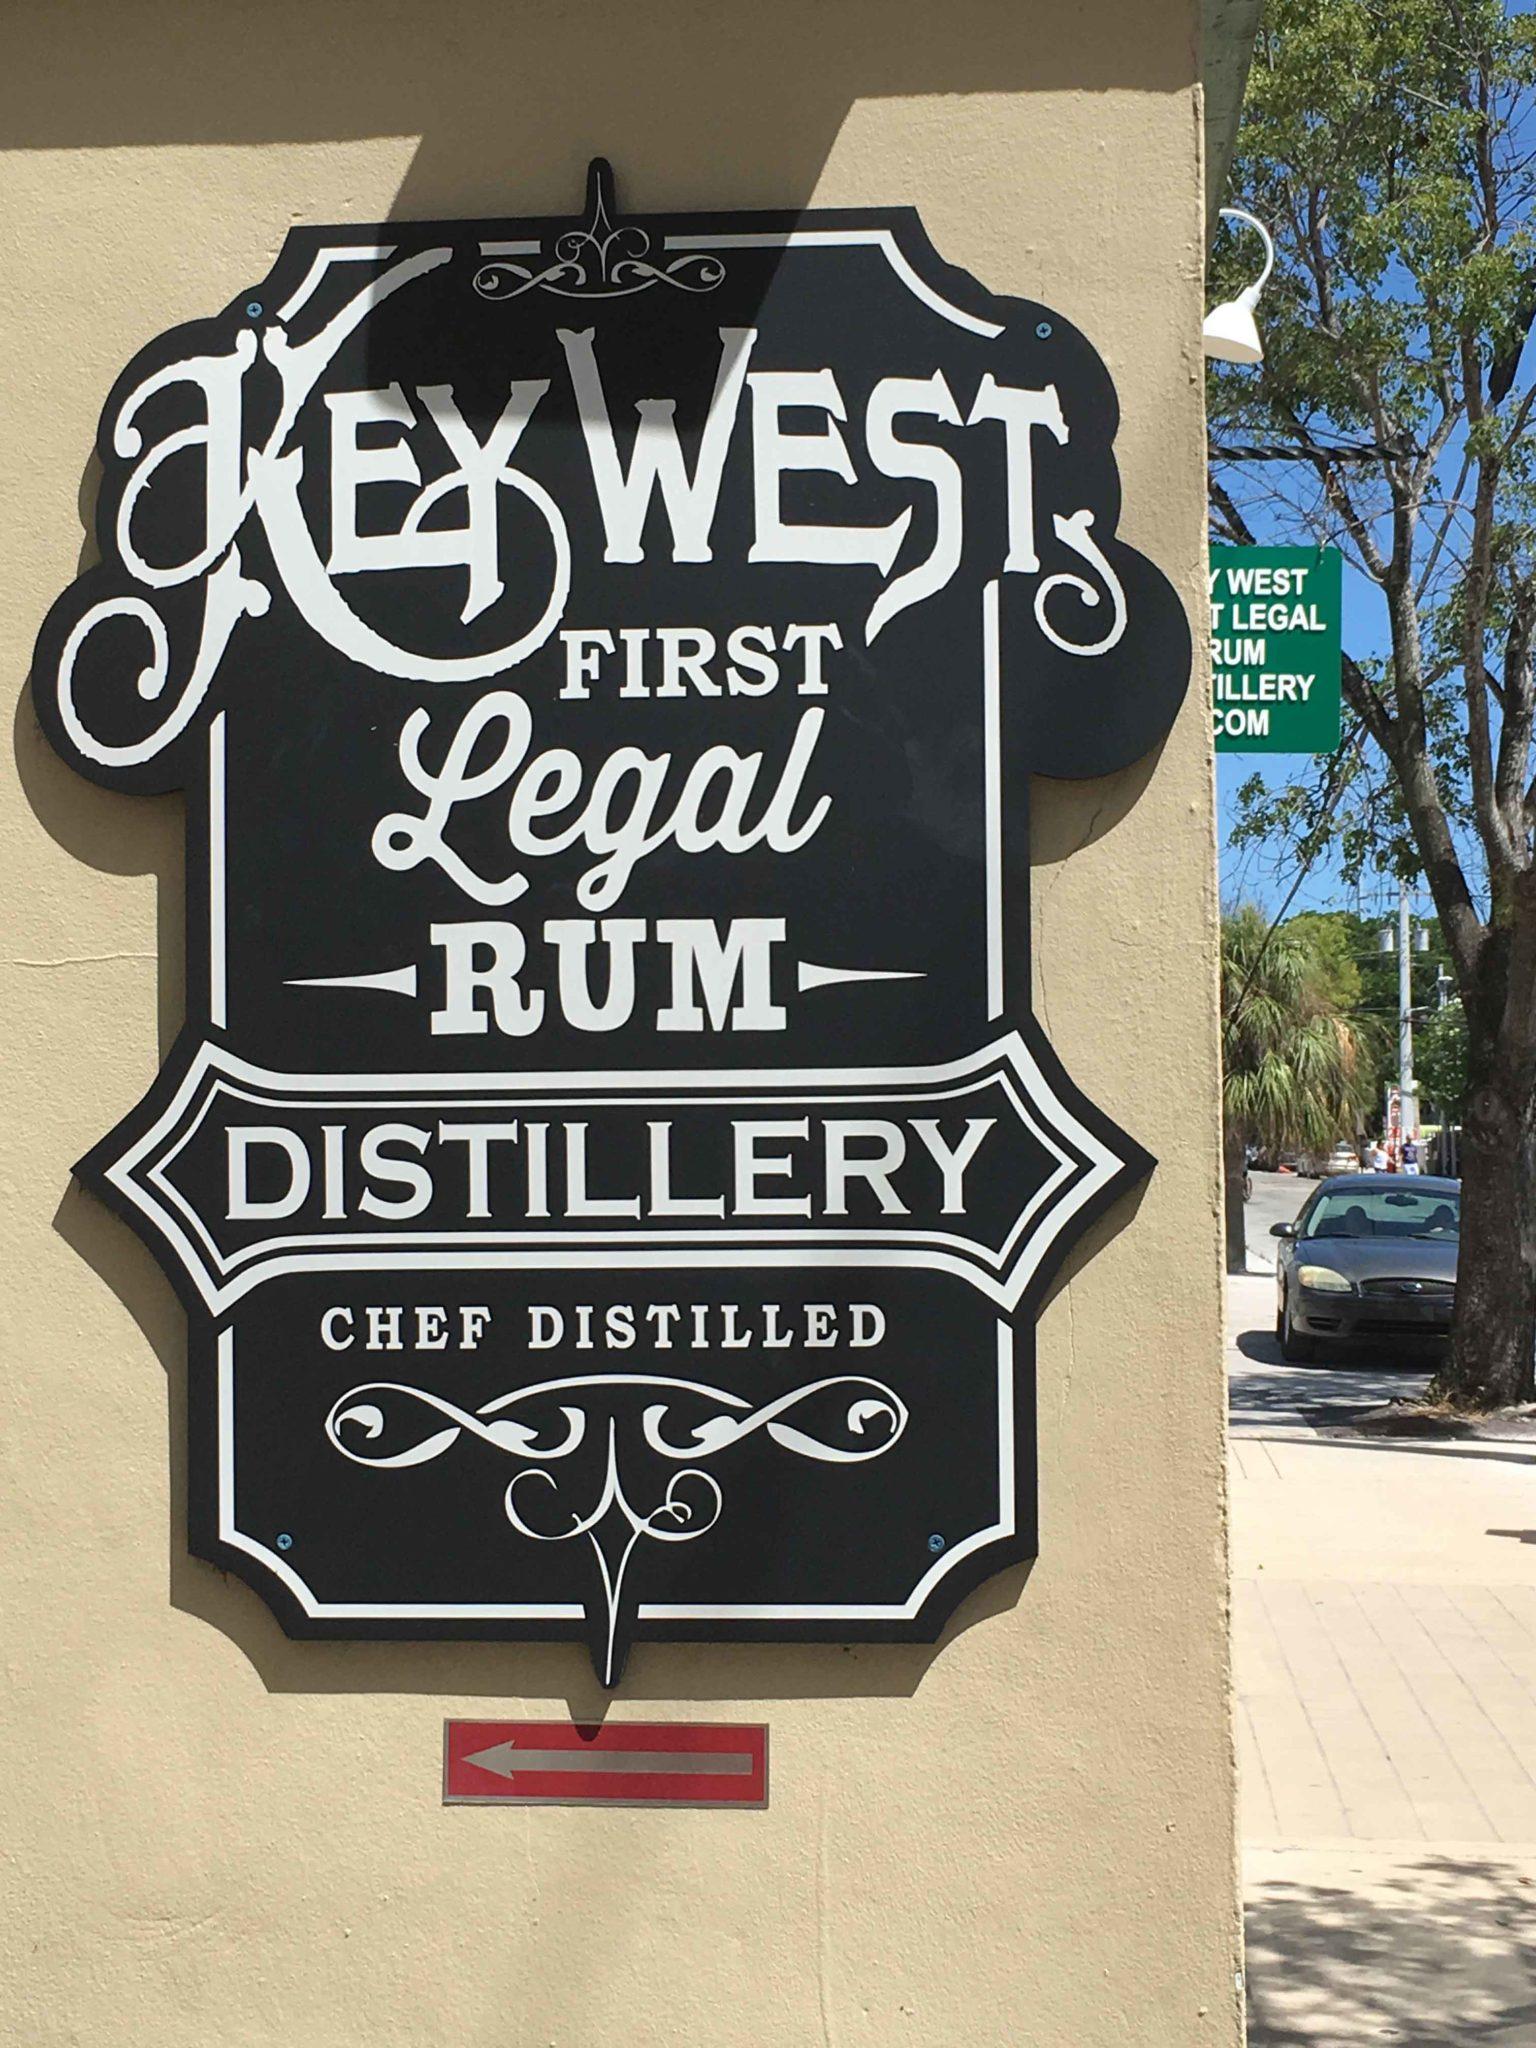 key west legal rum